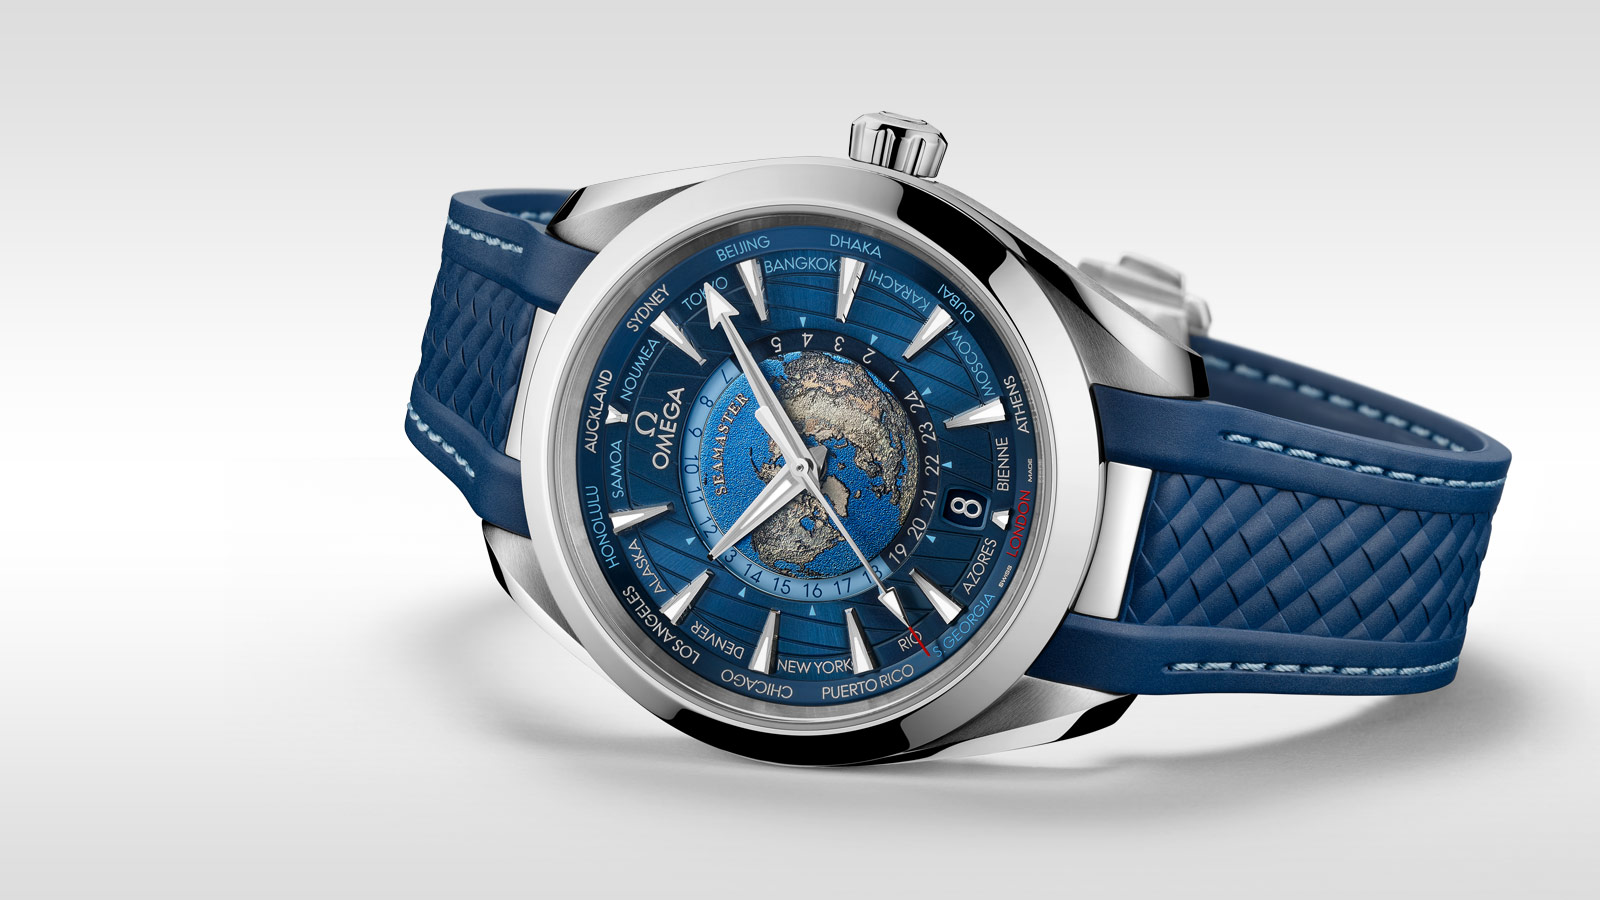 Seamaster 海马系列Aqua Terra 150米腕表 Aqua Terra 150米腕表 欧米茄同轴至臻天文台GMT世界时腕表43毫米 - 220.12.43.22.03.001 - 查看 2